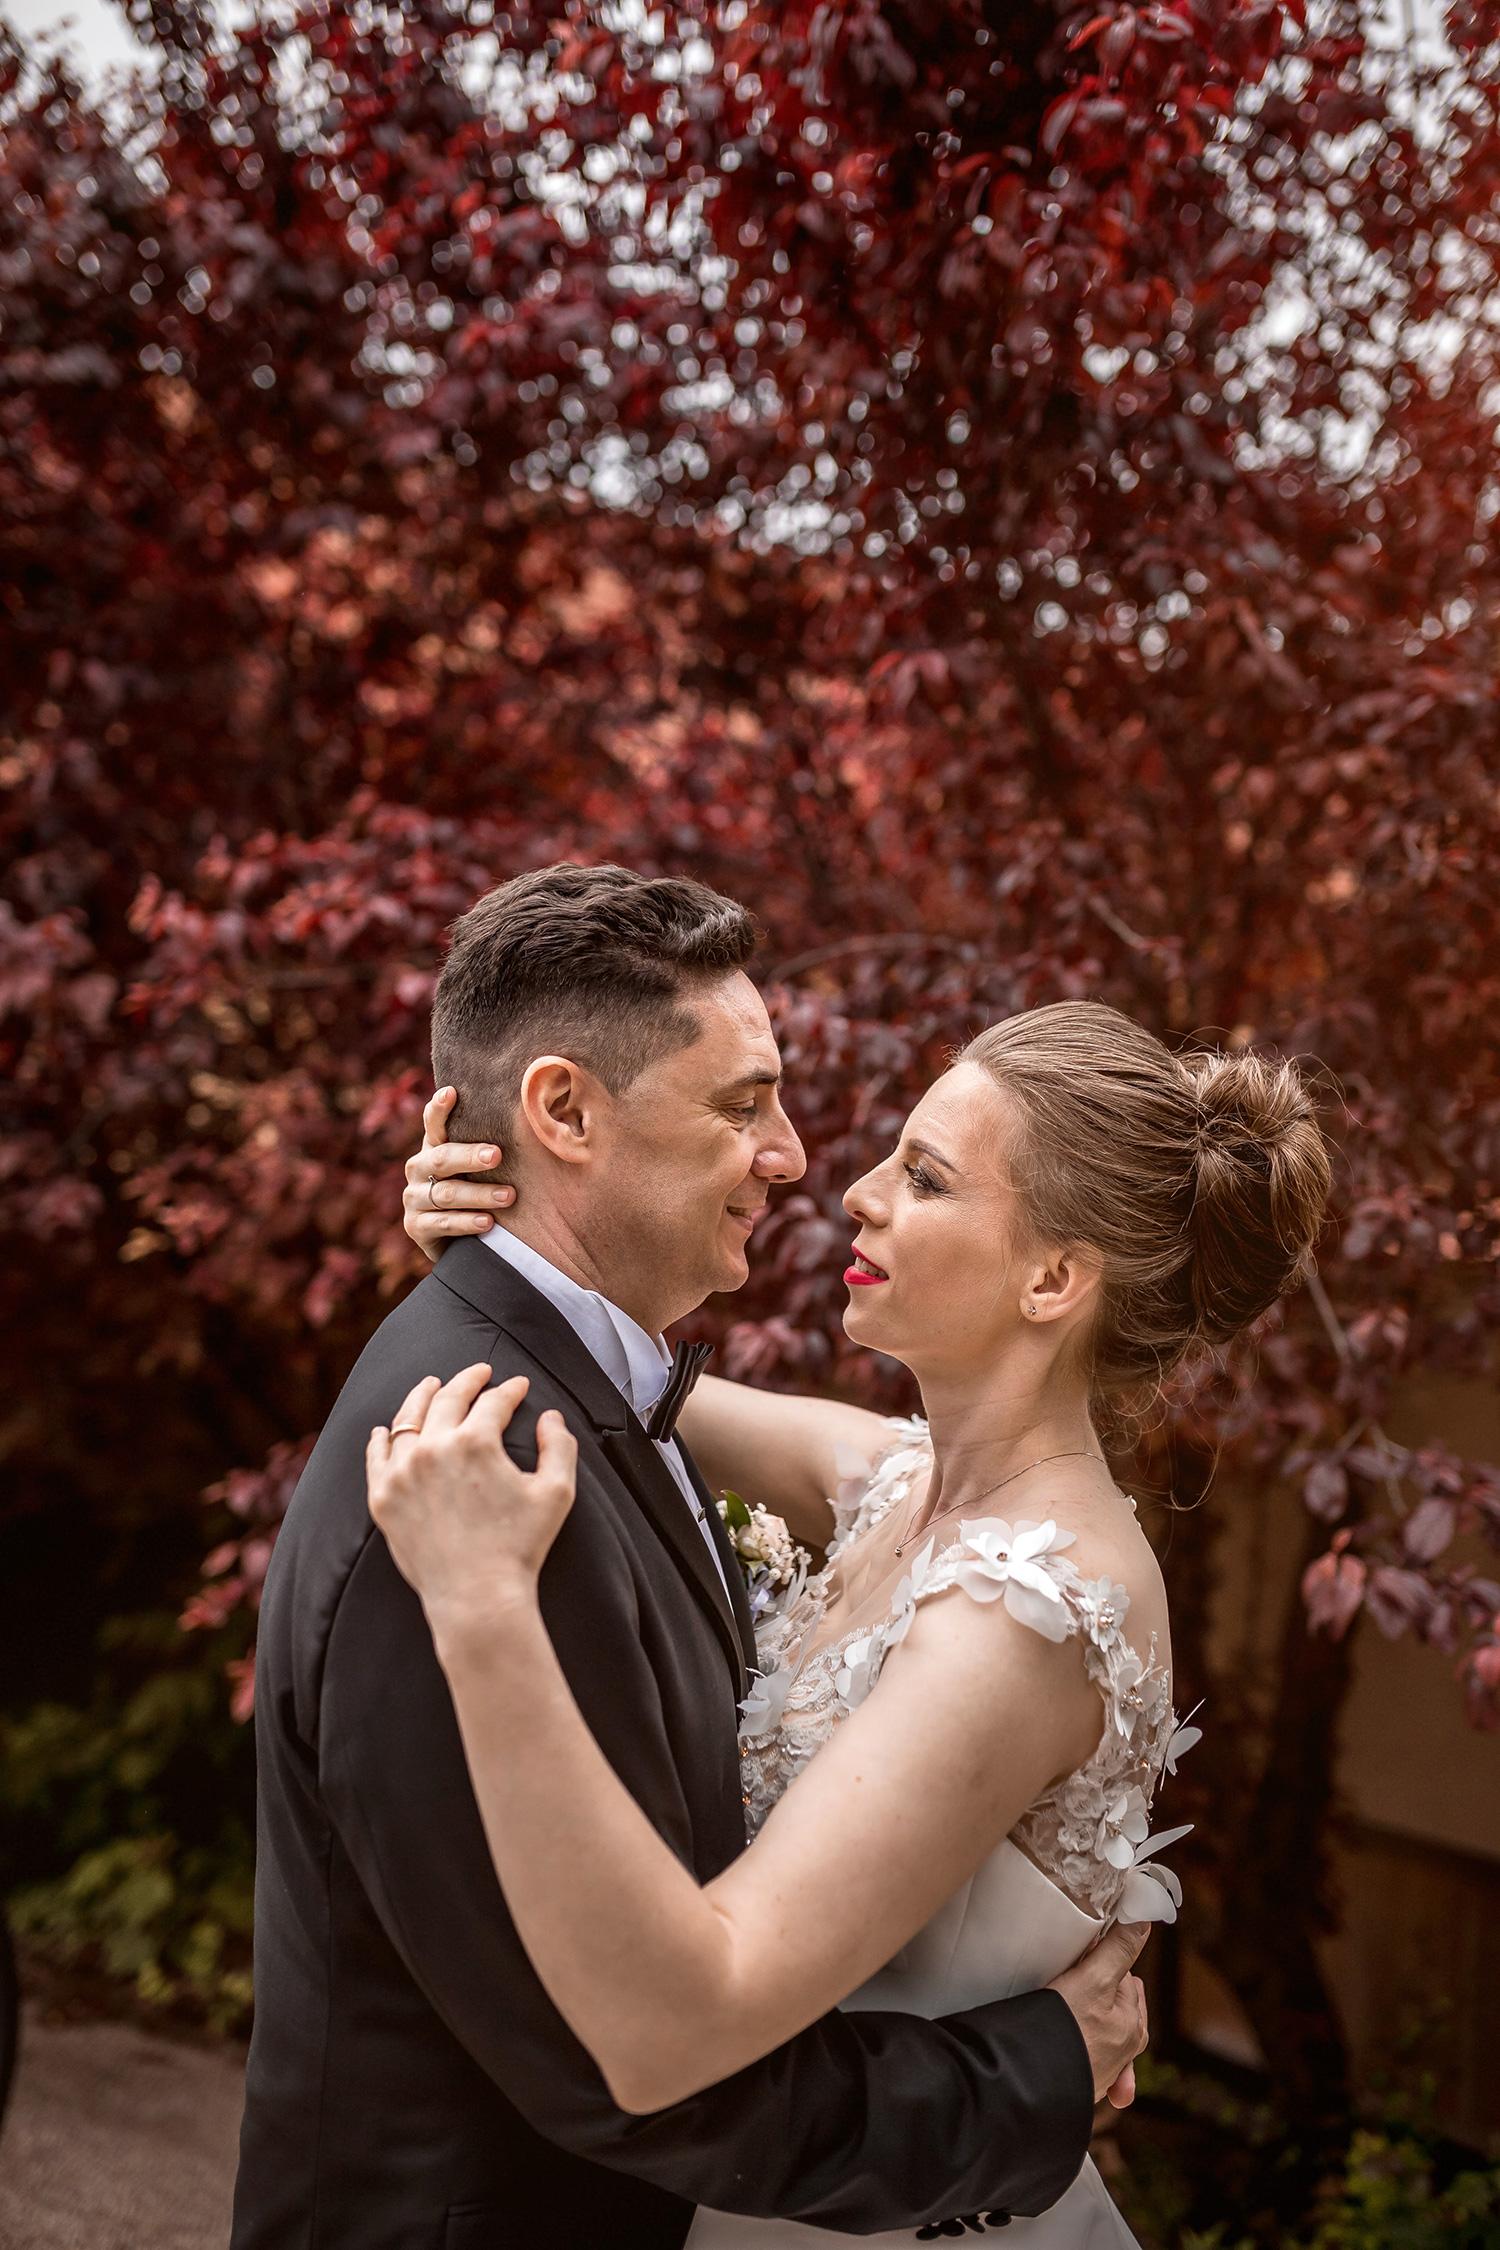 fotograf nunta iasi 025 1